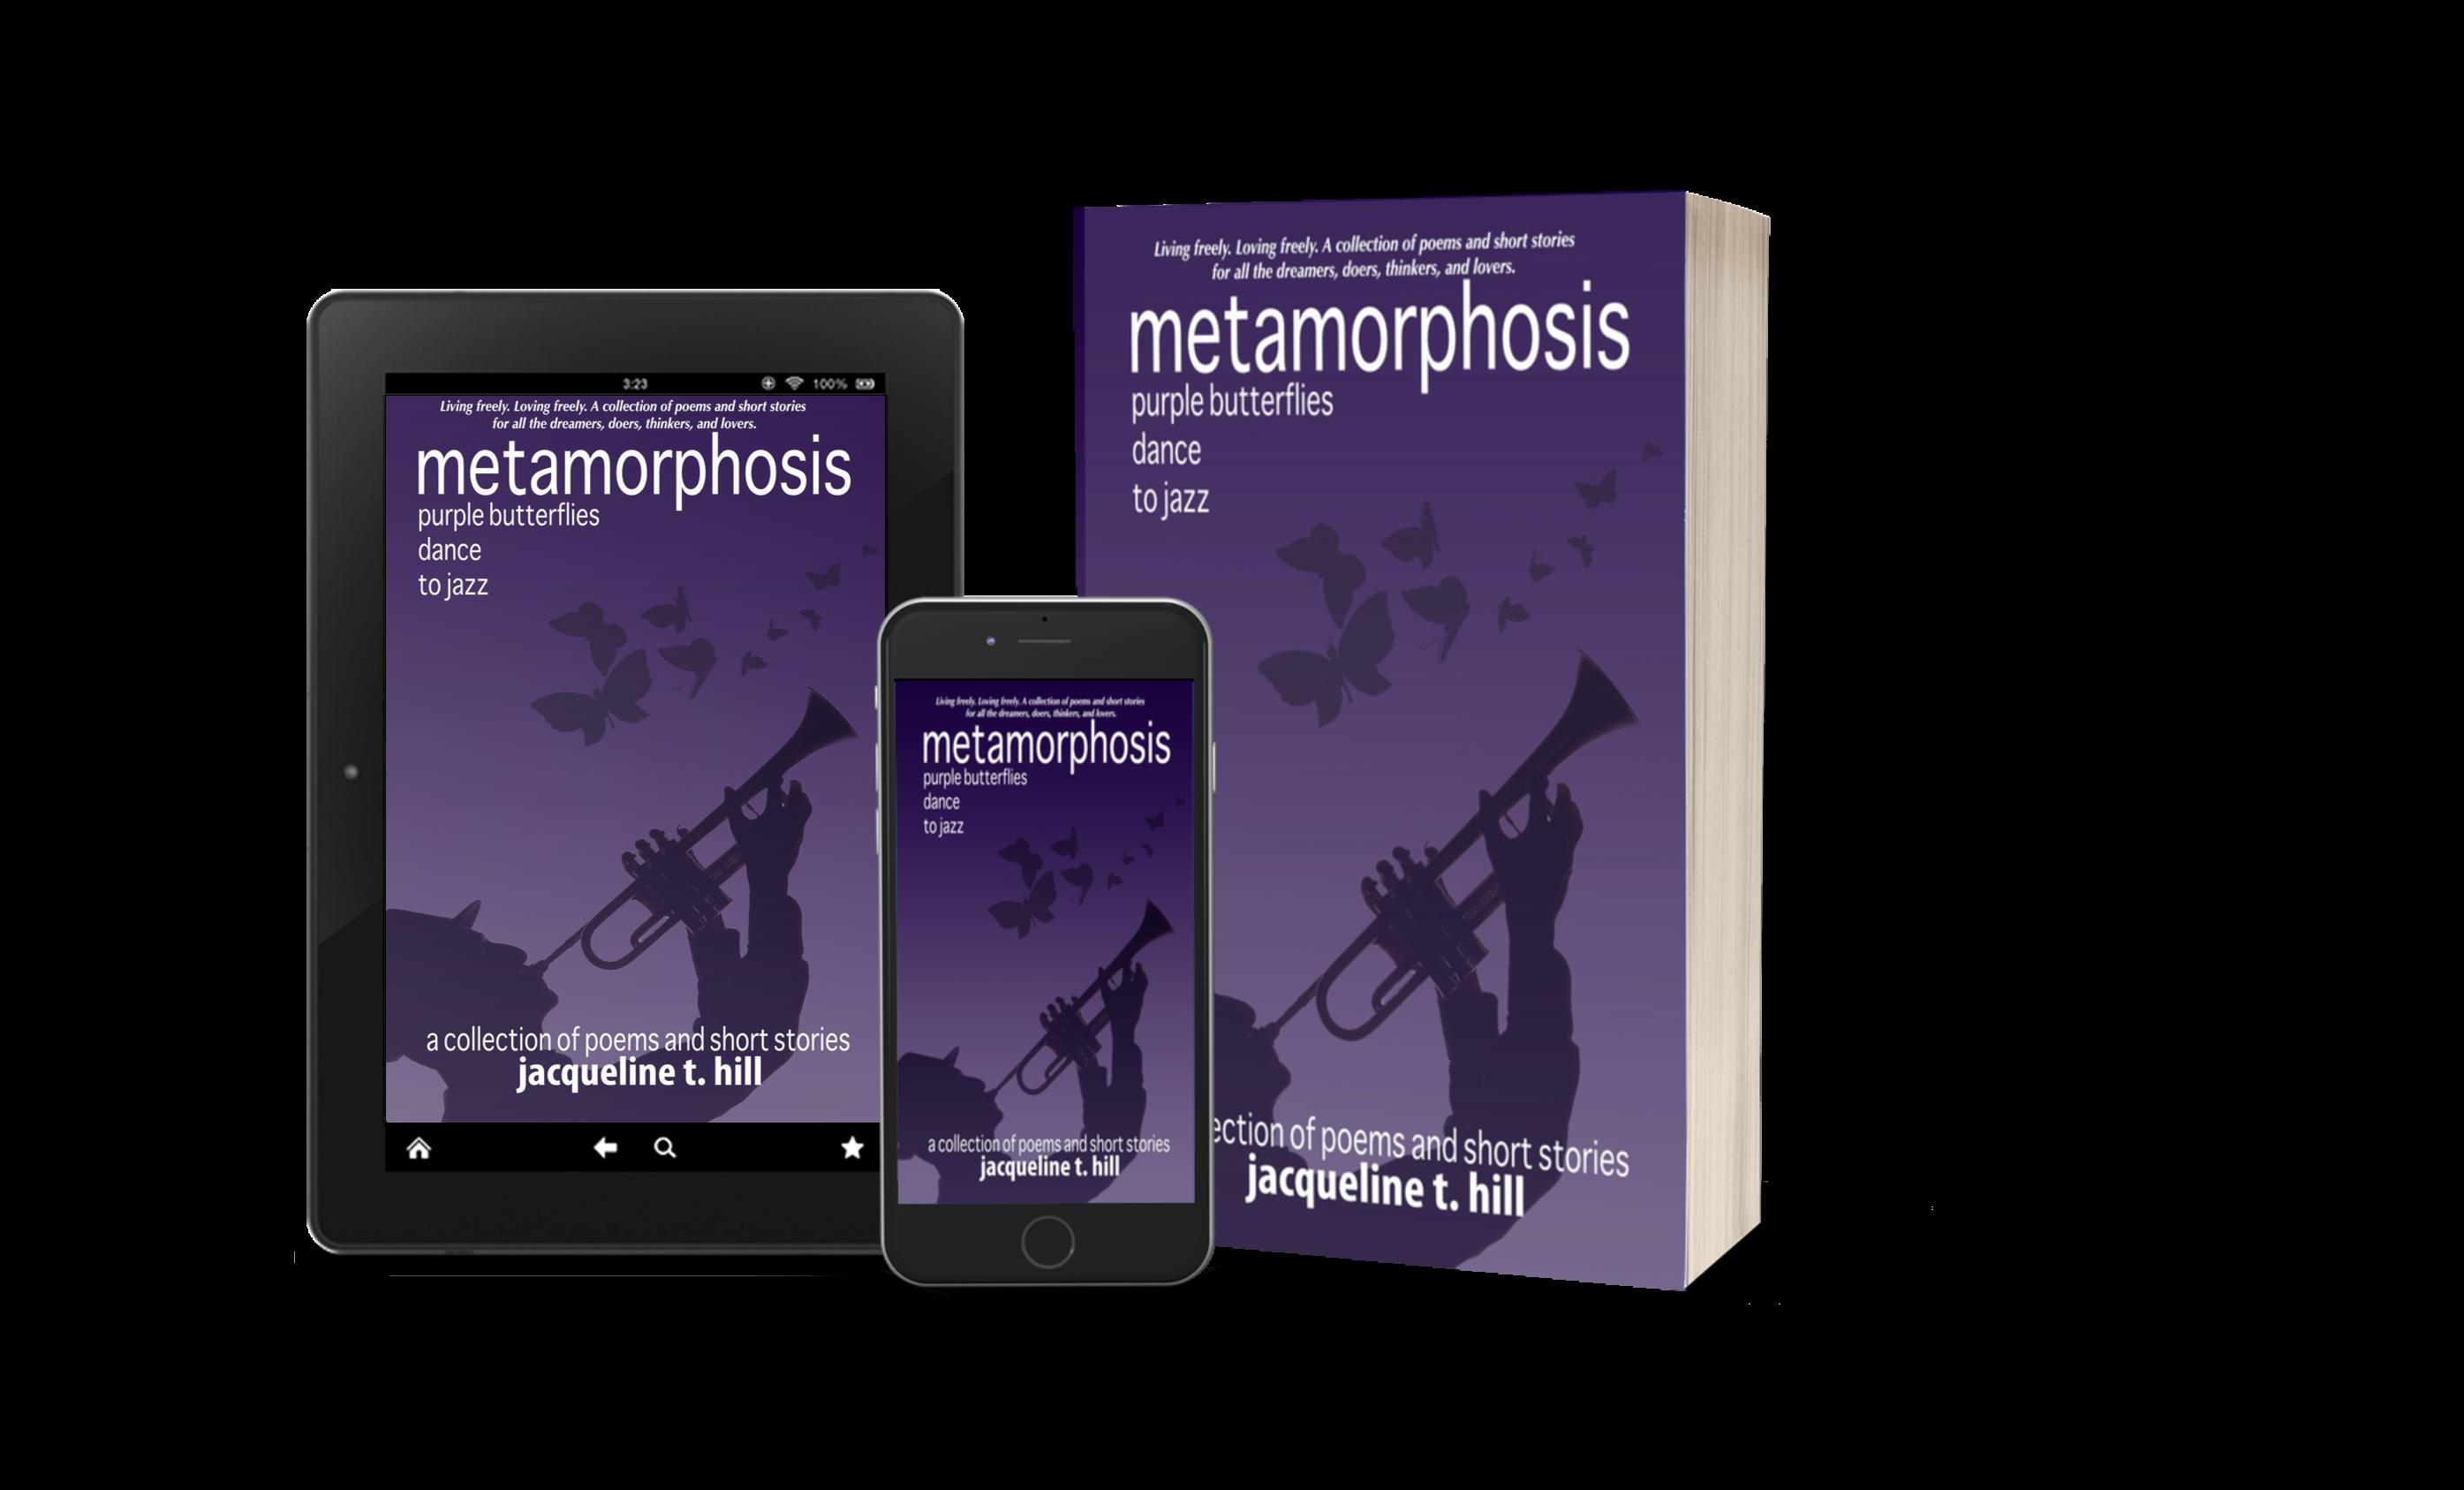 Metamorphosis: Purple Butterflies Dance To Jazz by Jacqueline T. Hill